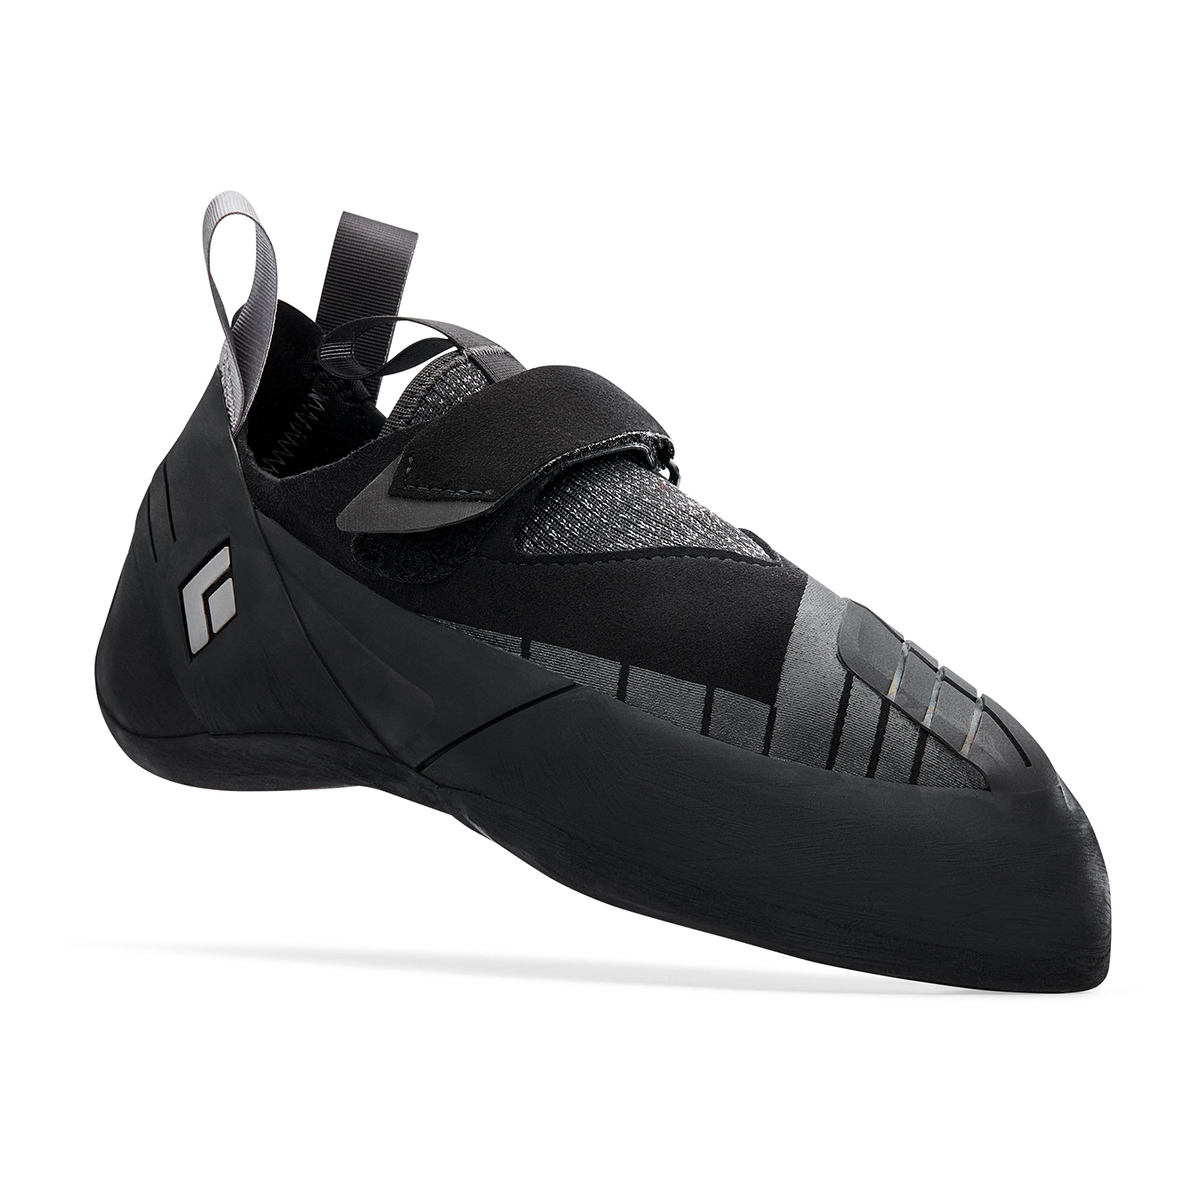 Shadow Shoe Black Diamond